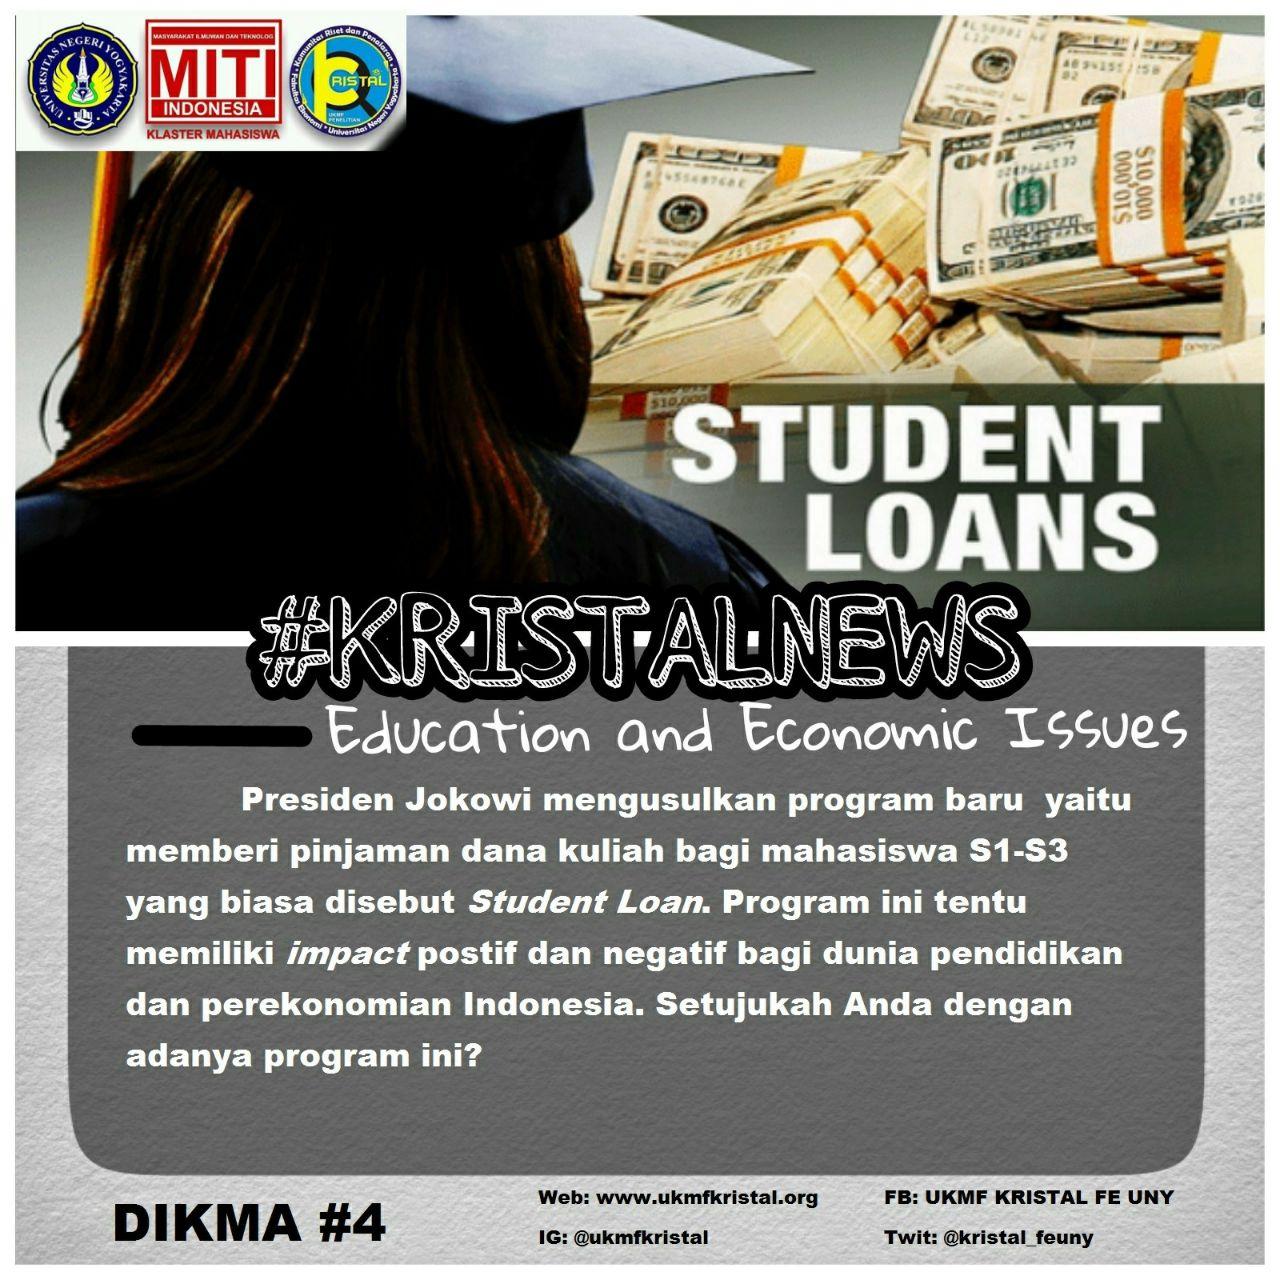 Polemik Program Student Loan Ukmf Penelitian Kristal Fe Uny